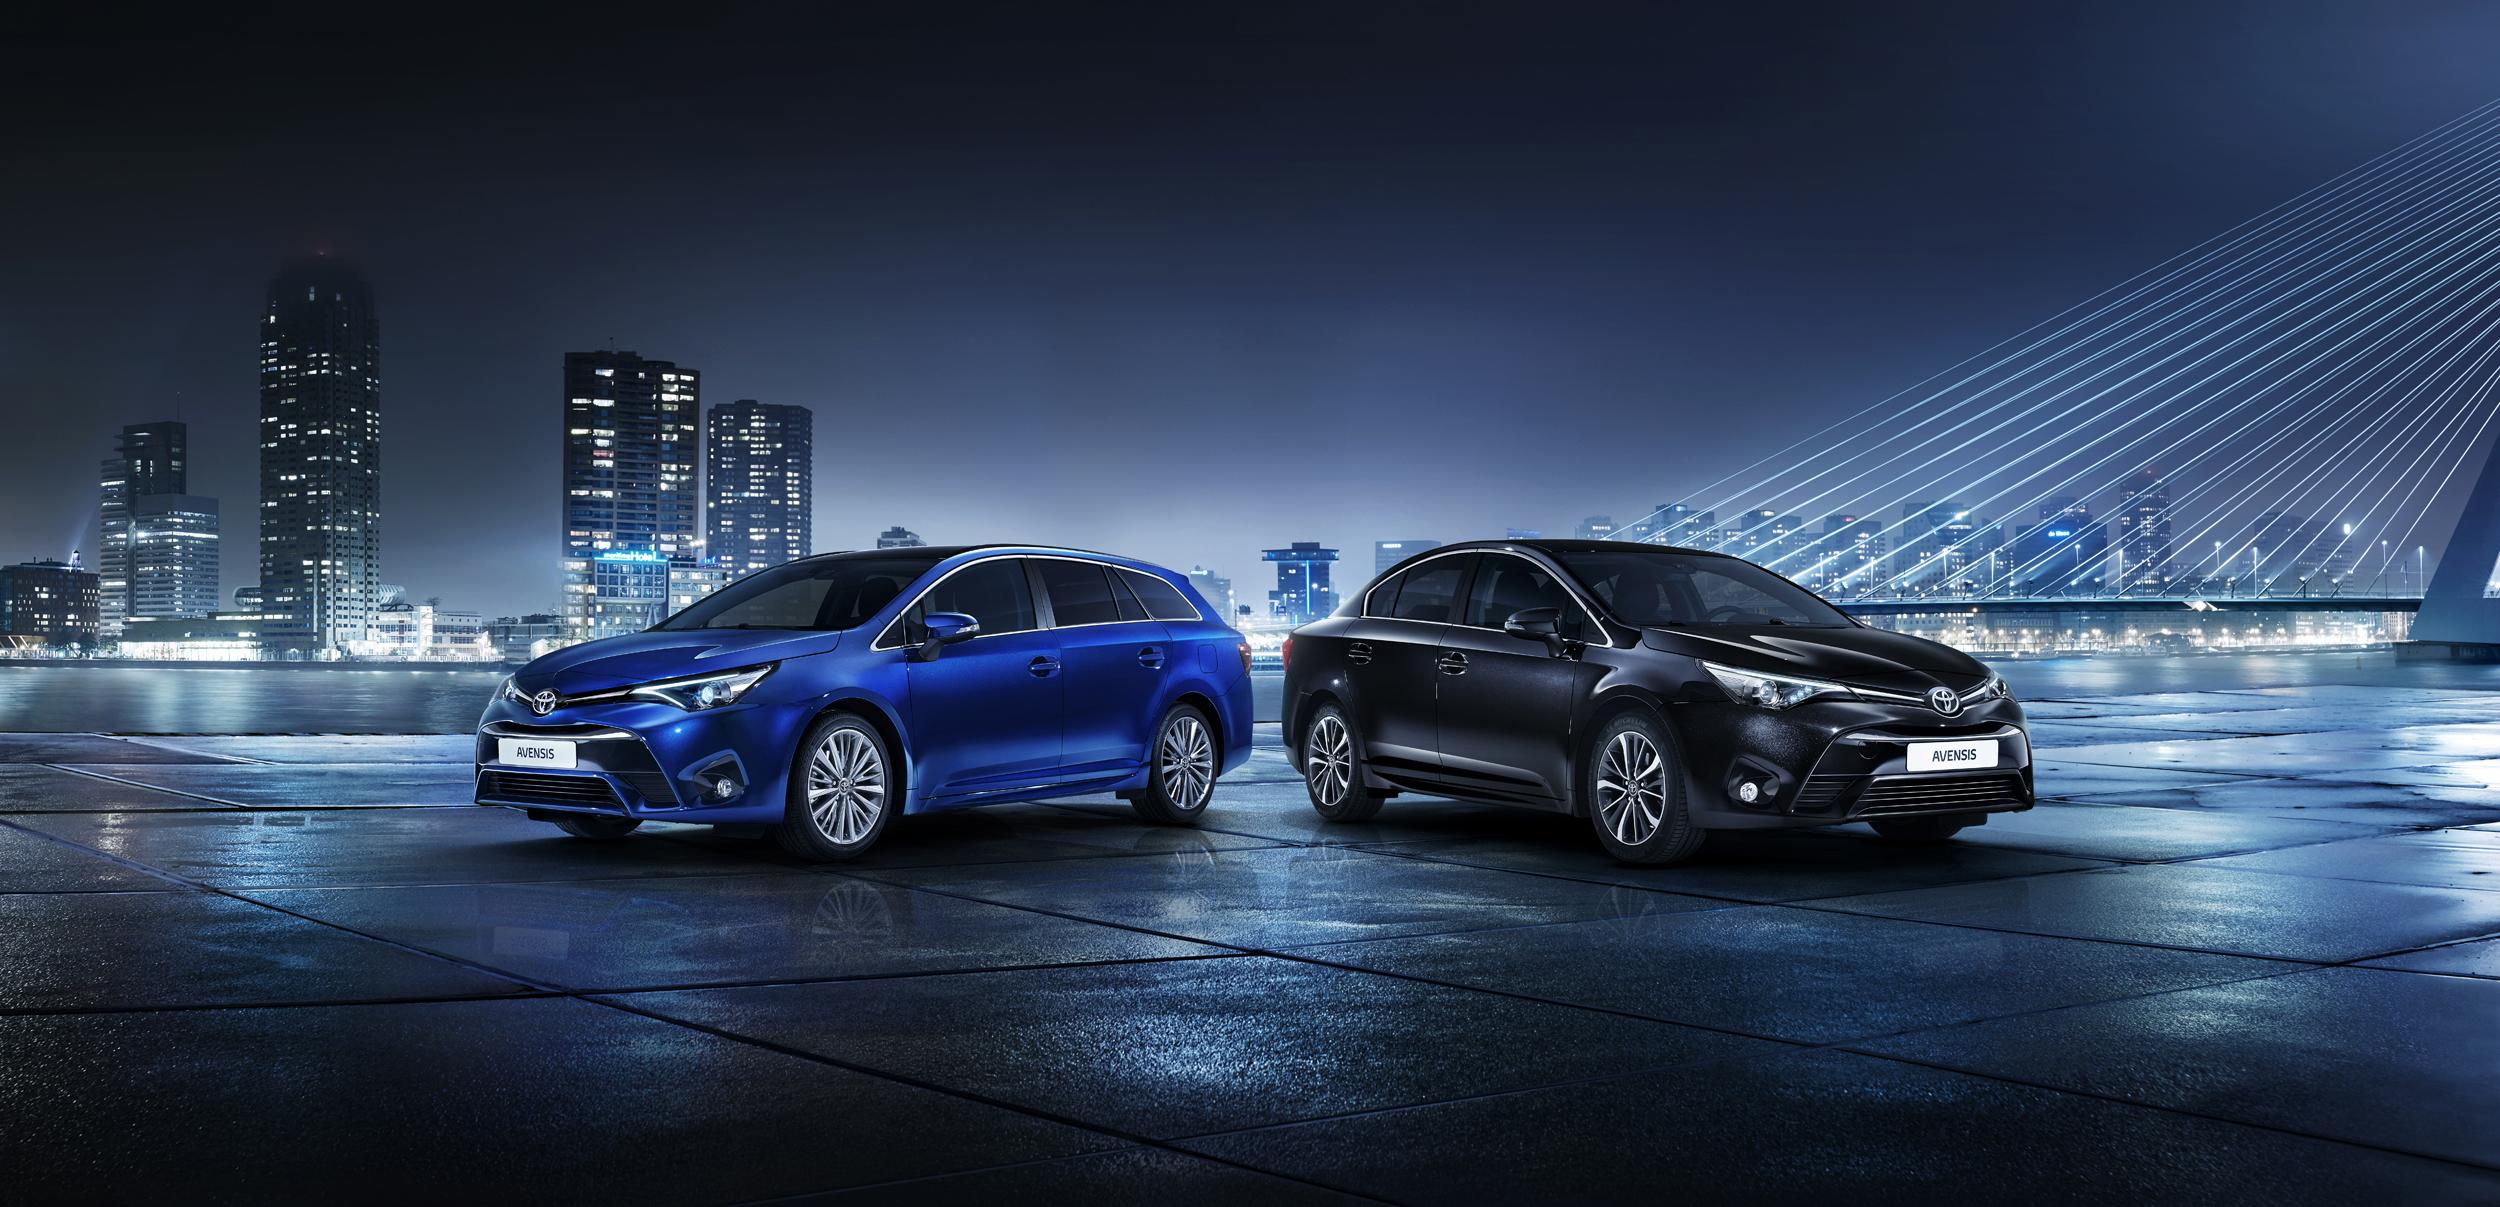 AUTO.RIA – Новые Тойота Авенсис в Украине: продажа, цены, фото